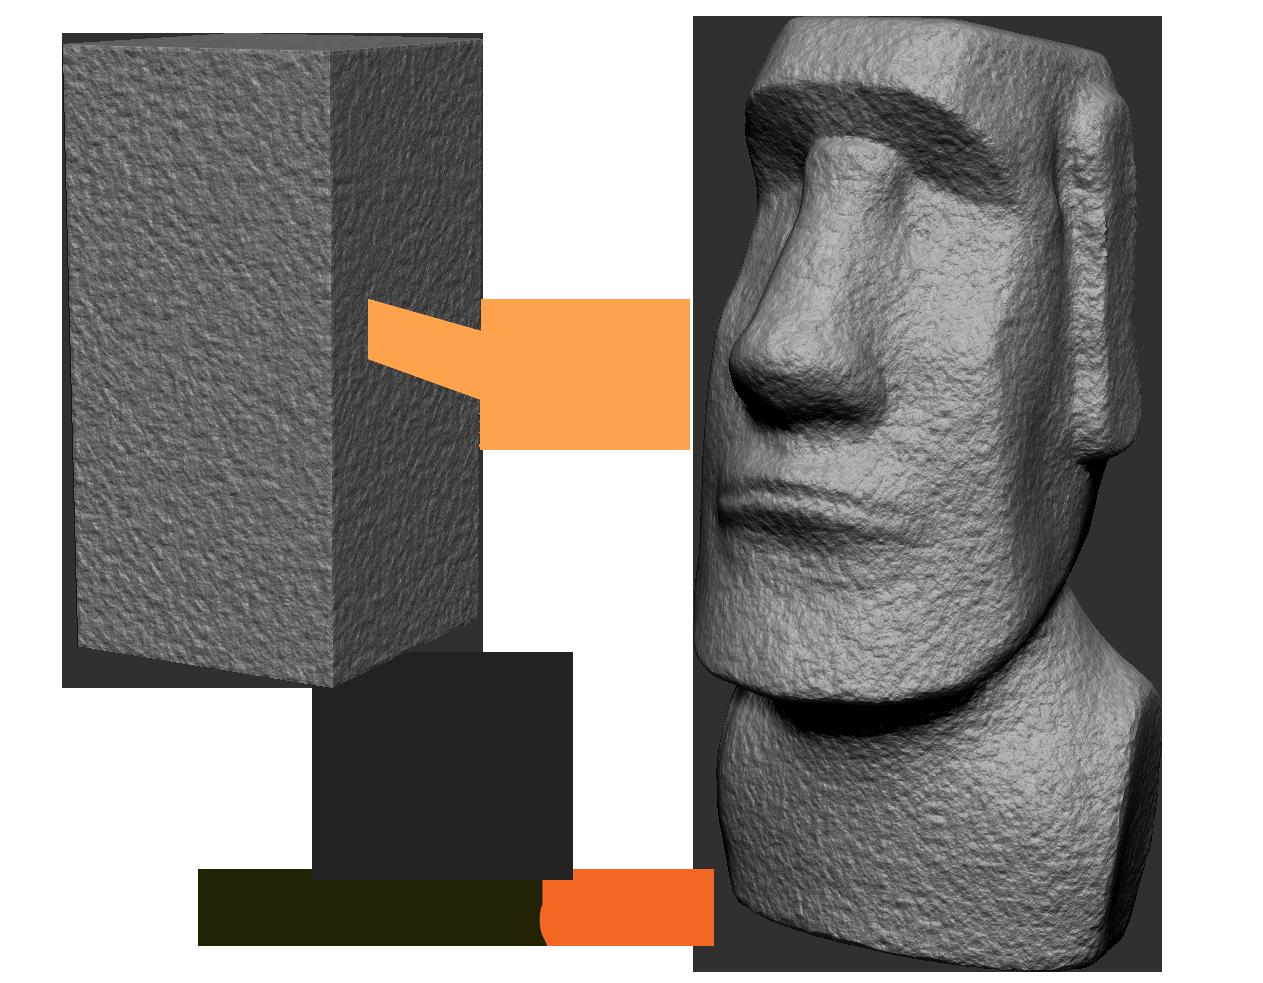 ZBrushCoreMini stone sculpt